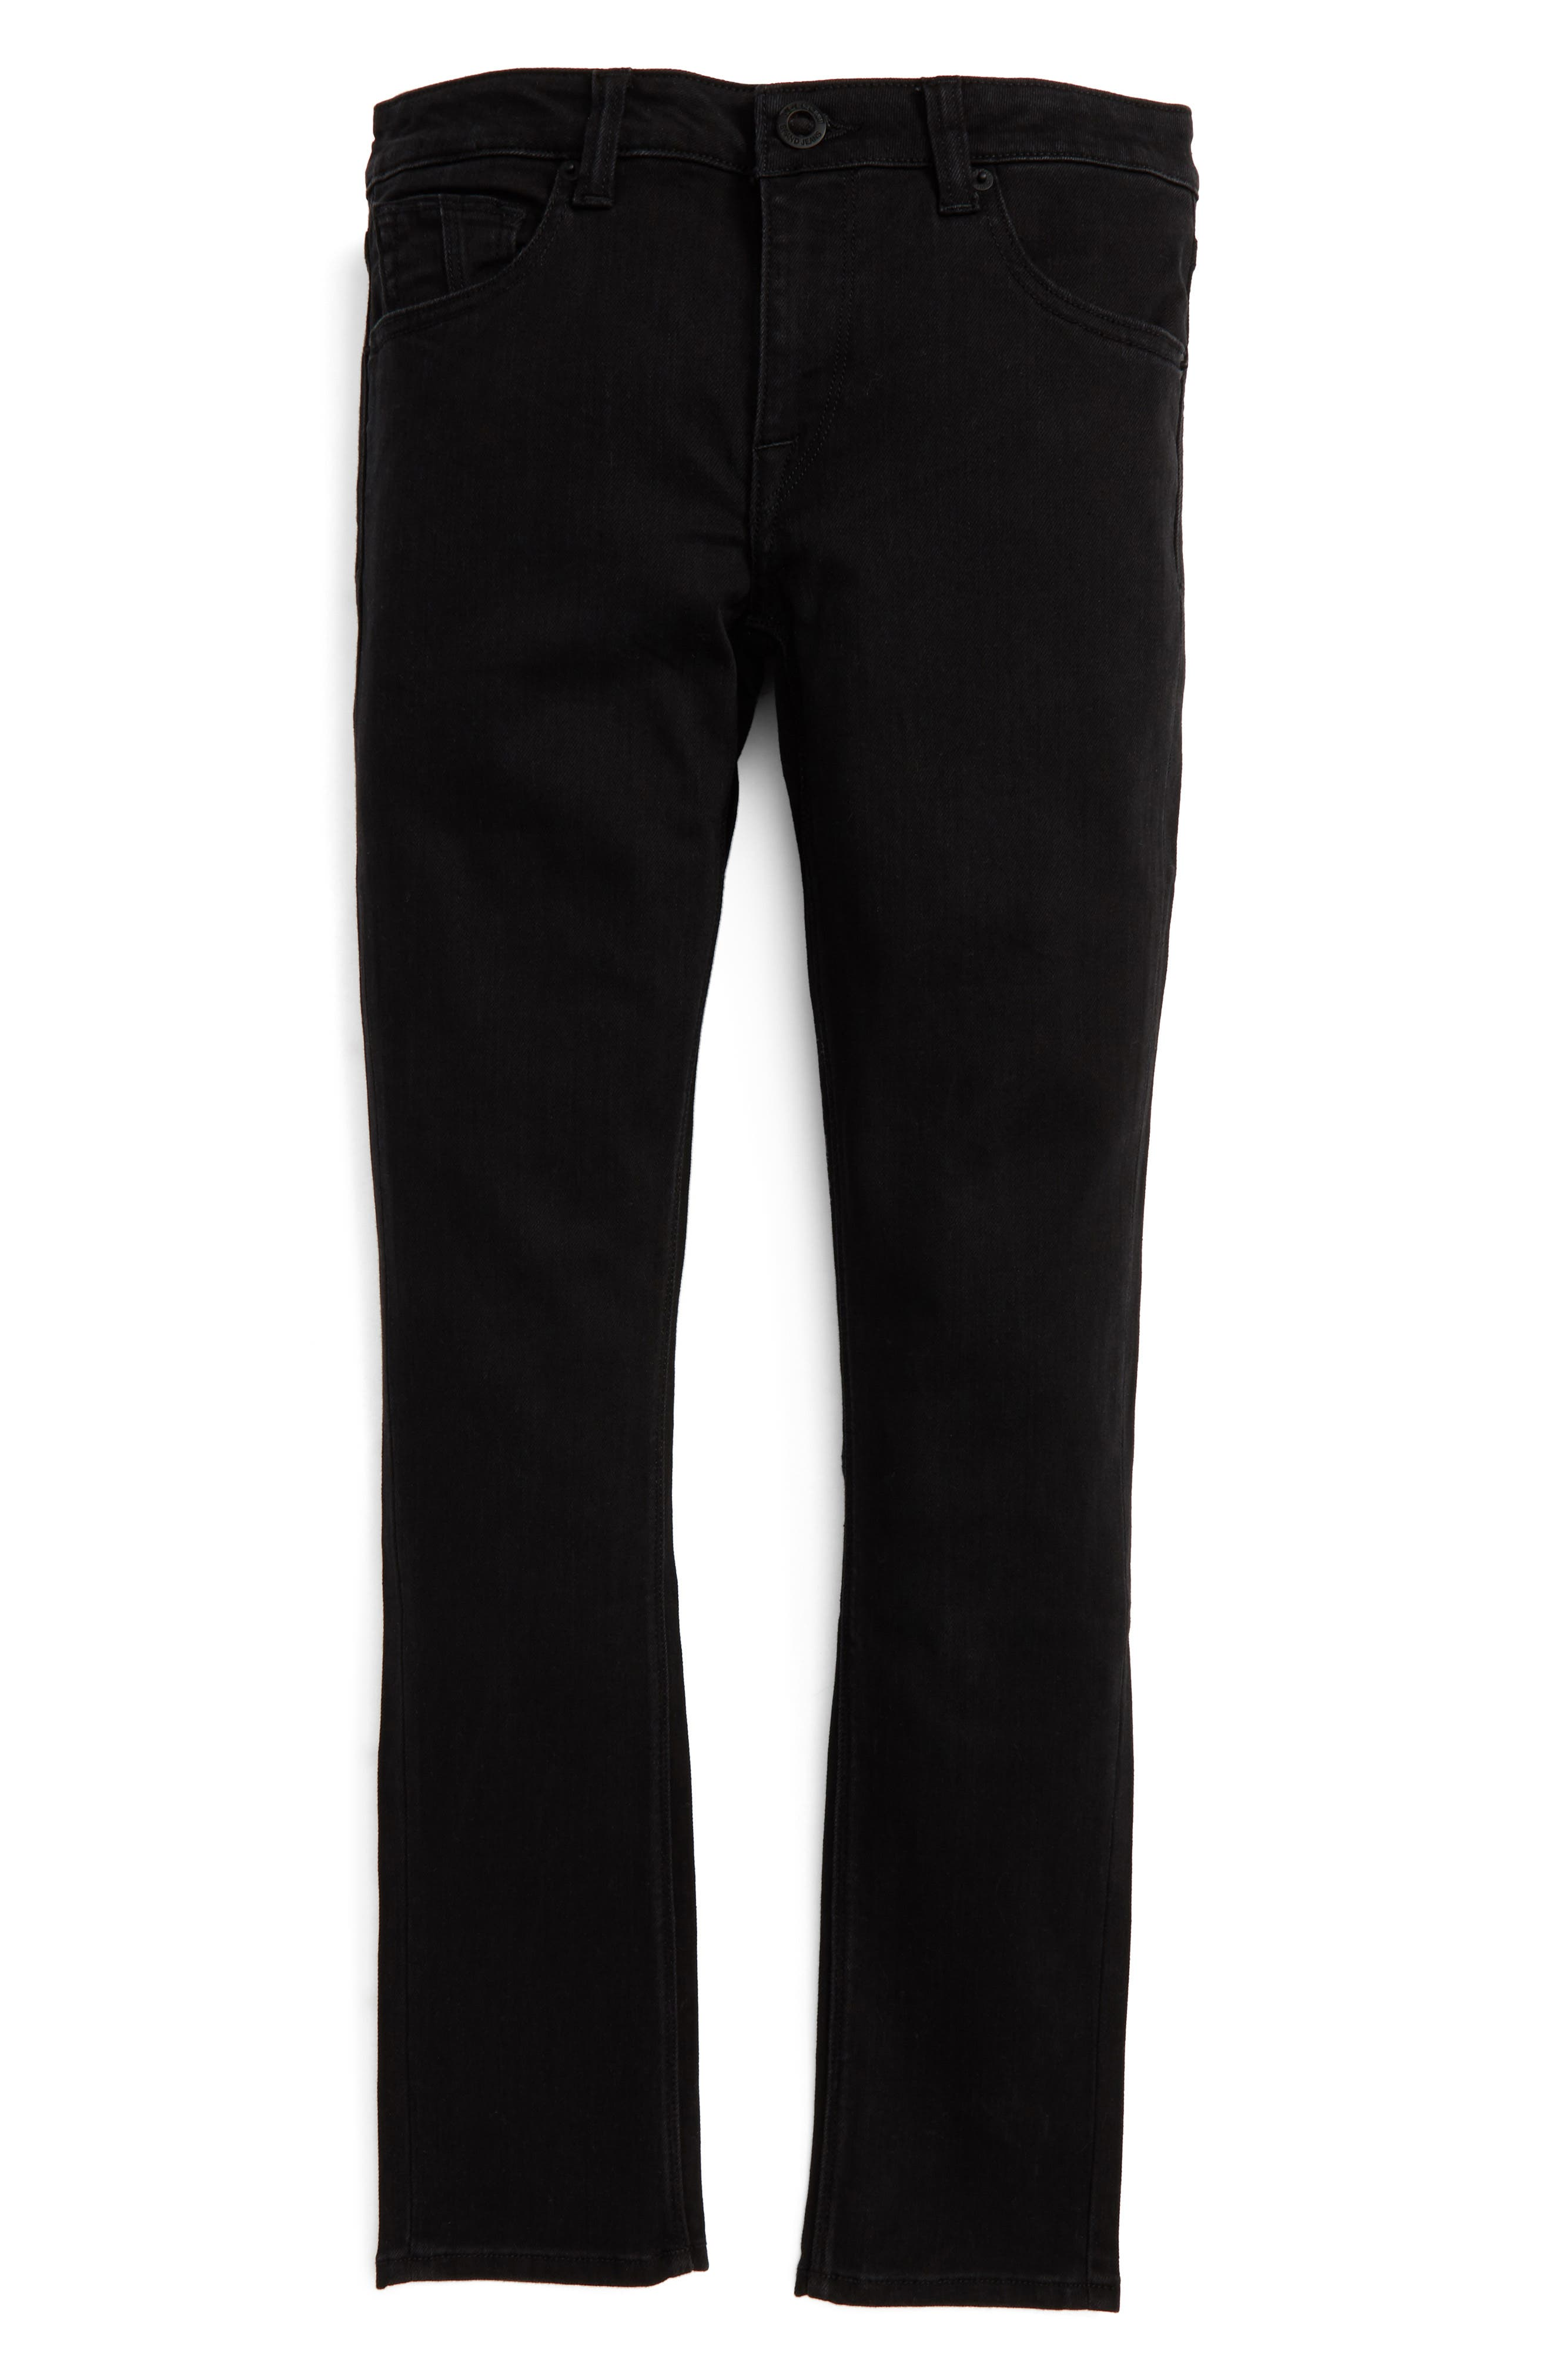 'Solver' Straight Leg Denim Jeans,                         Main,                         color, New Black